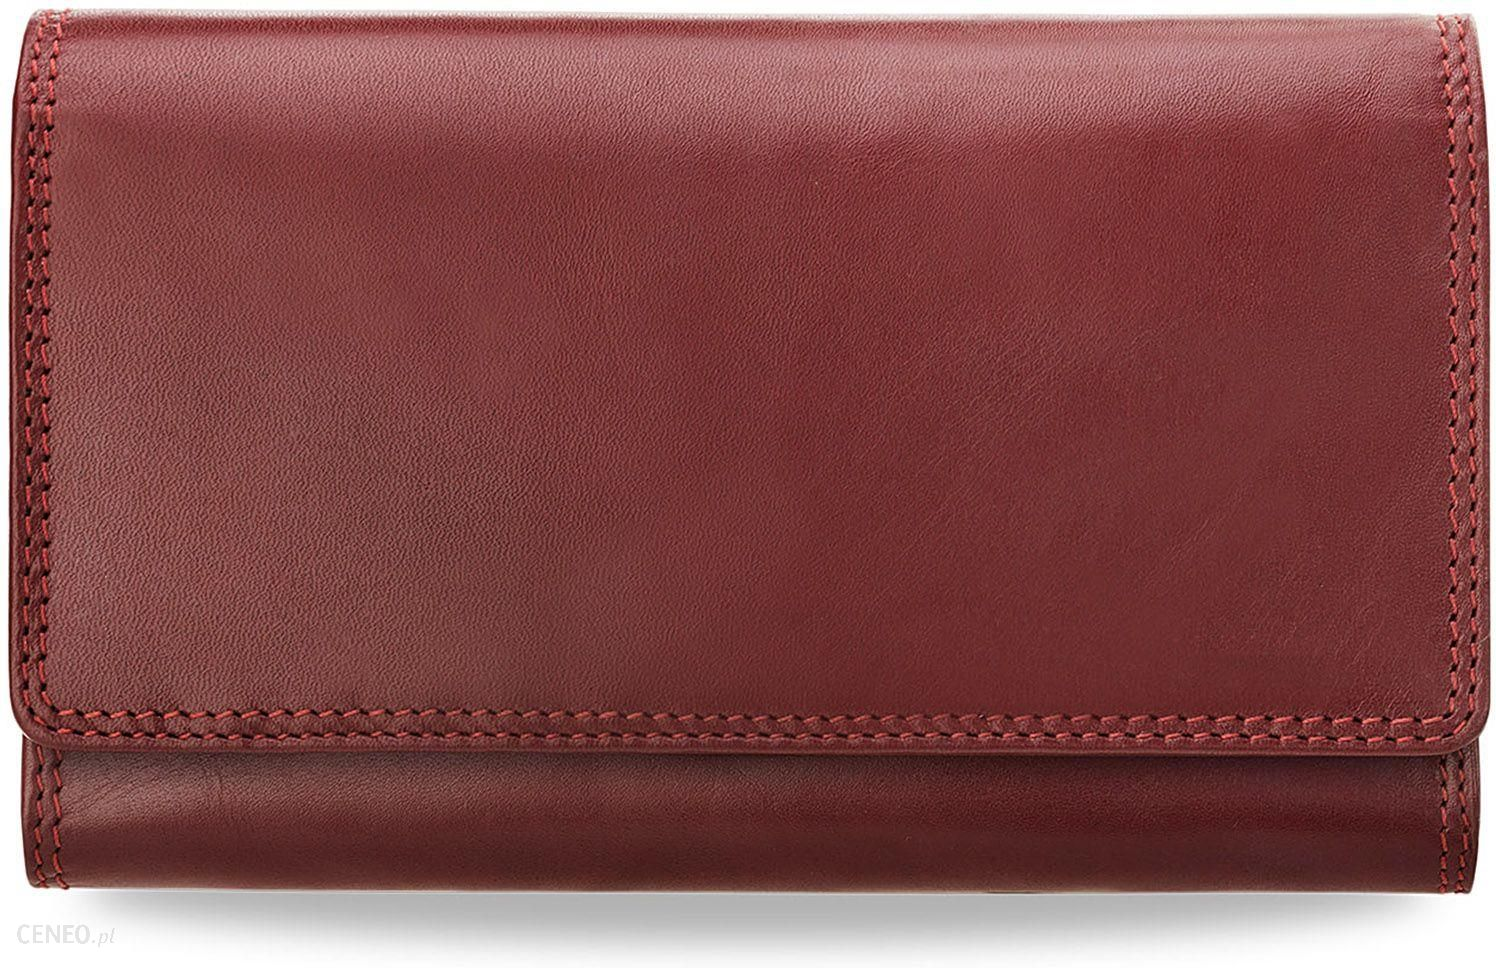 43cd14a3c0589 Duży ekskluzywny portfel damski visconti skórzana portmonetka - zdjęcie 1